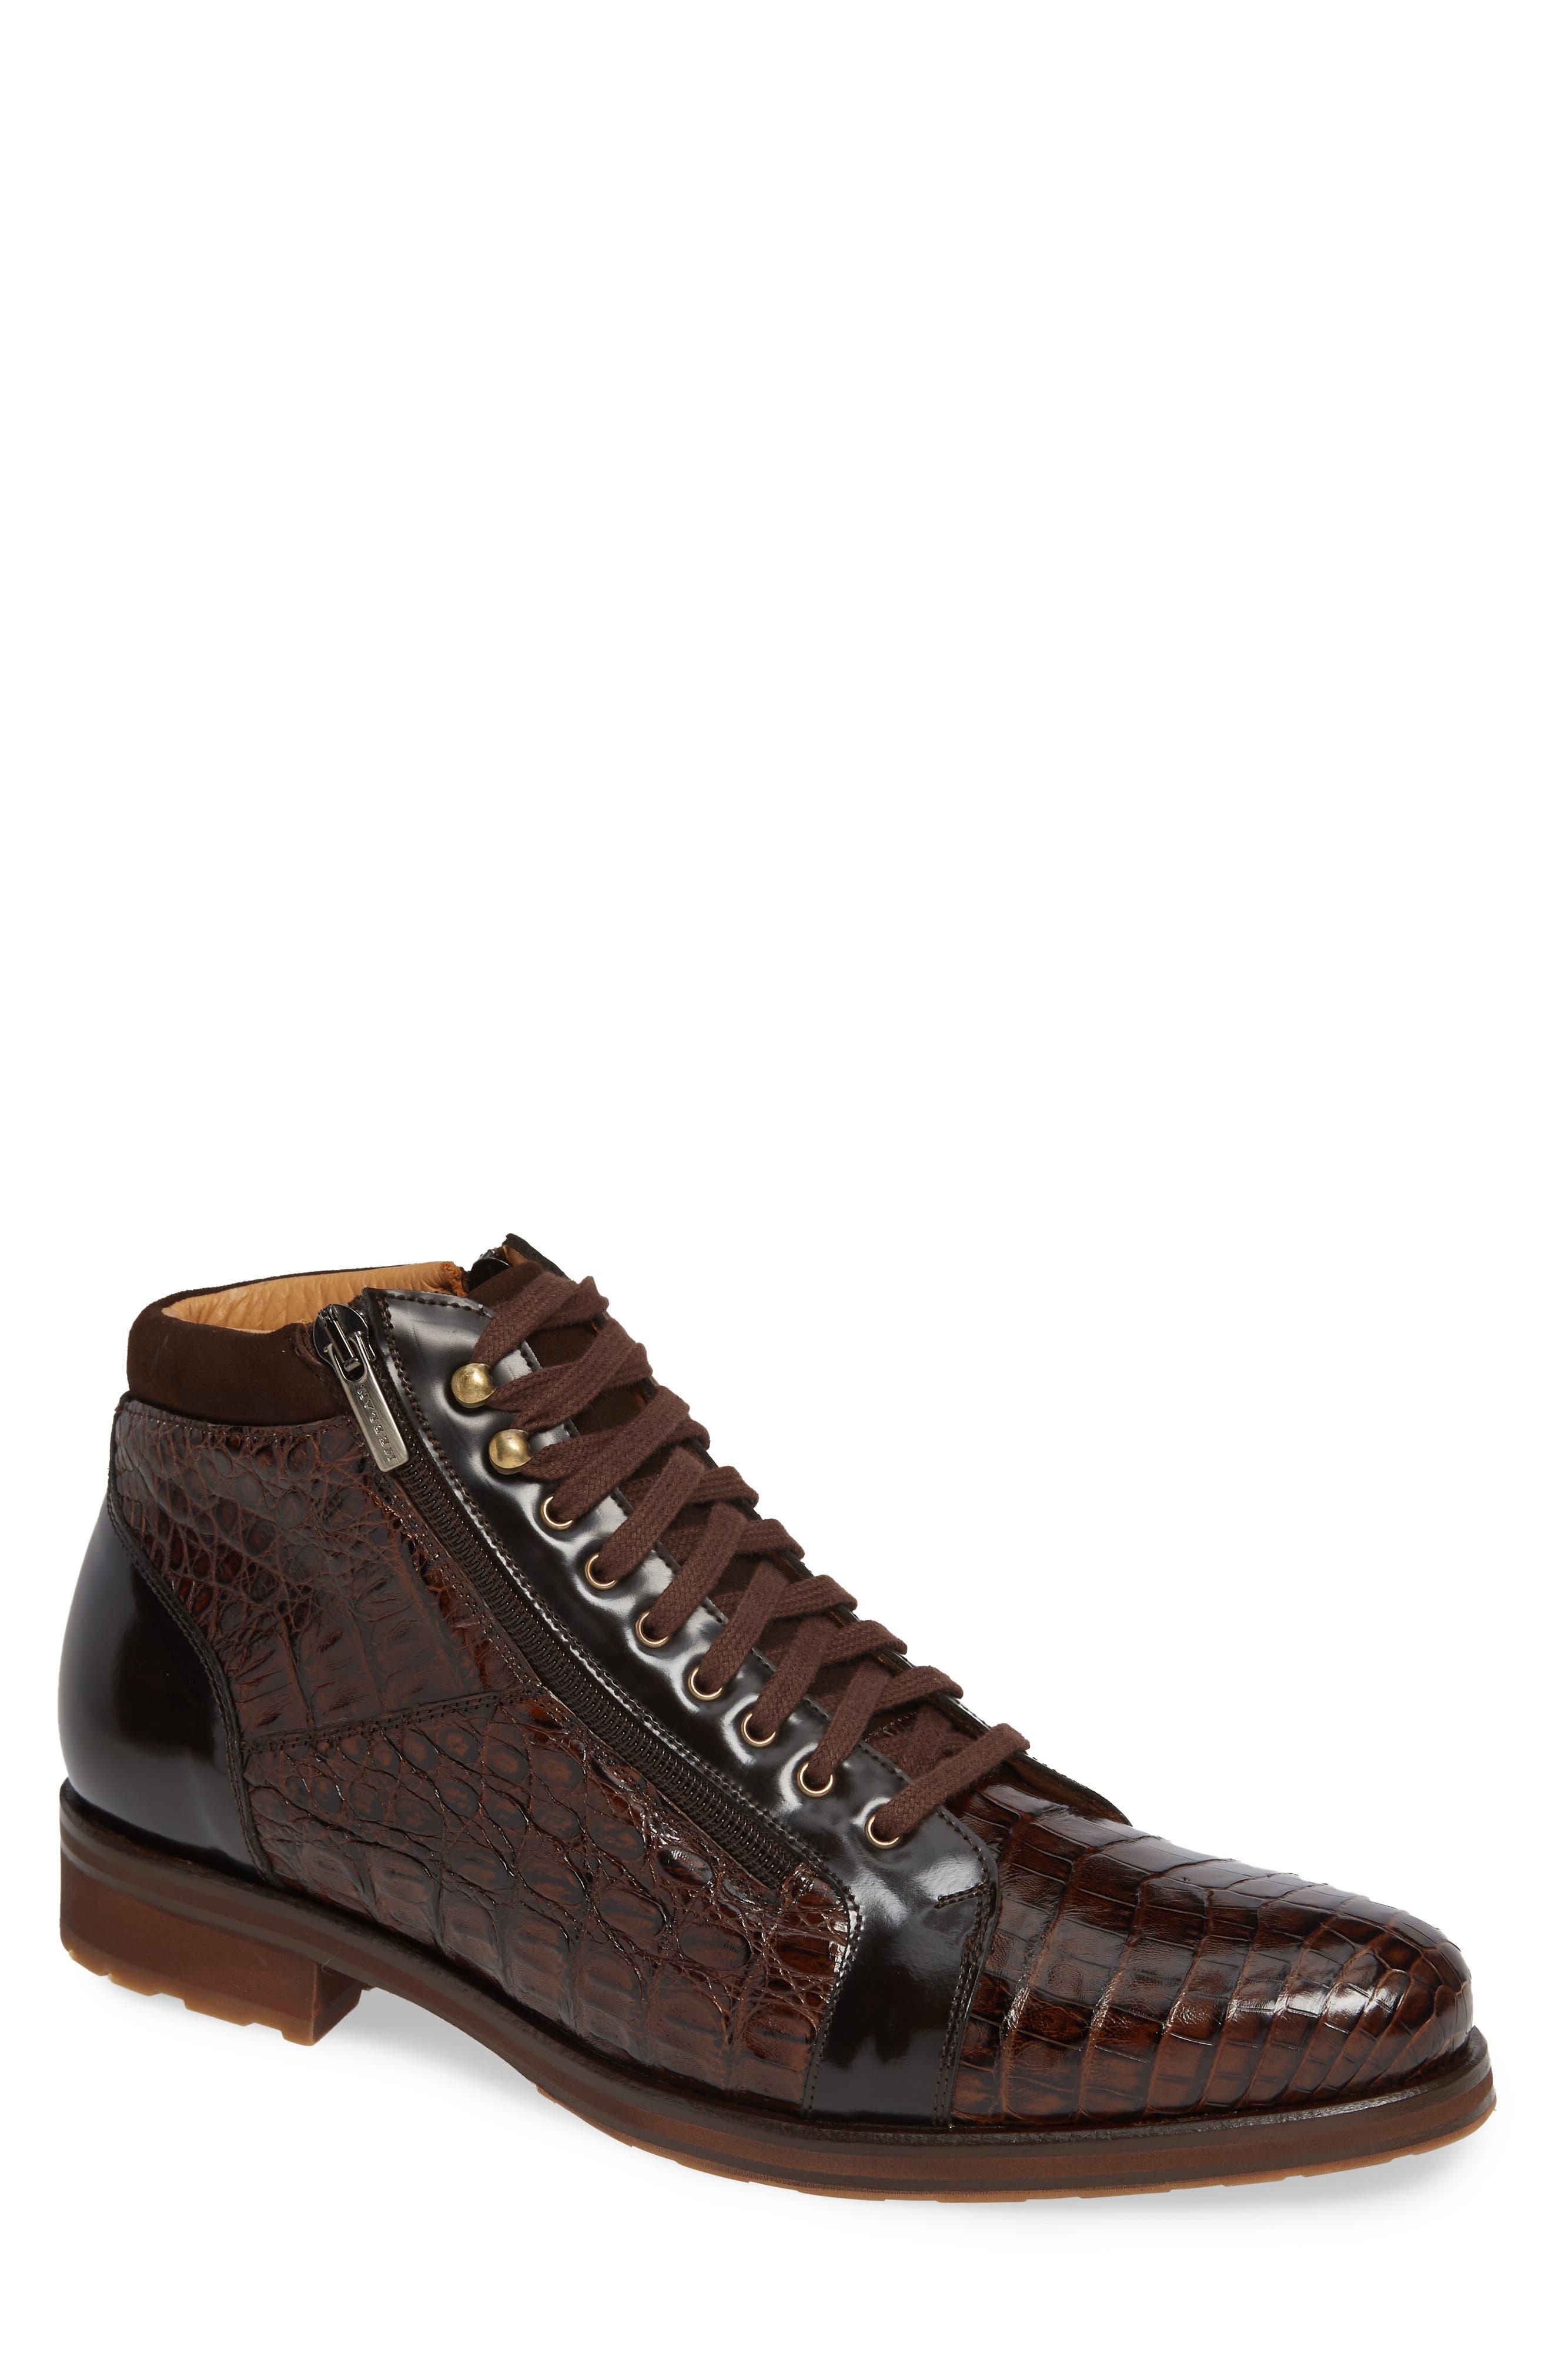 Manson Genuine Crocodile Boot,                         Main,                         color, BROWN LEATHER